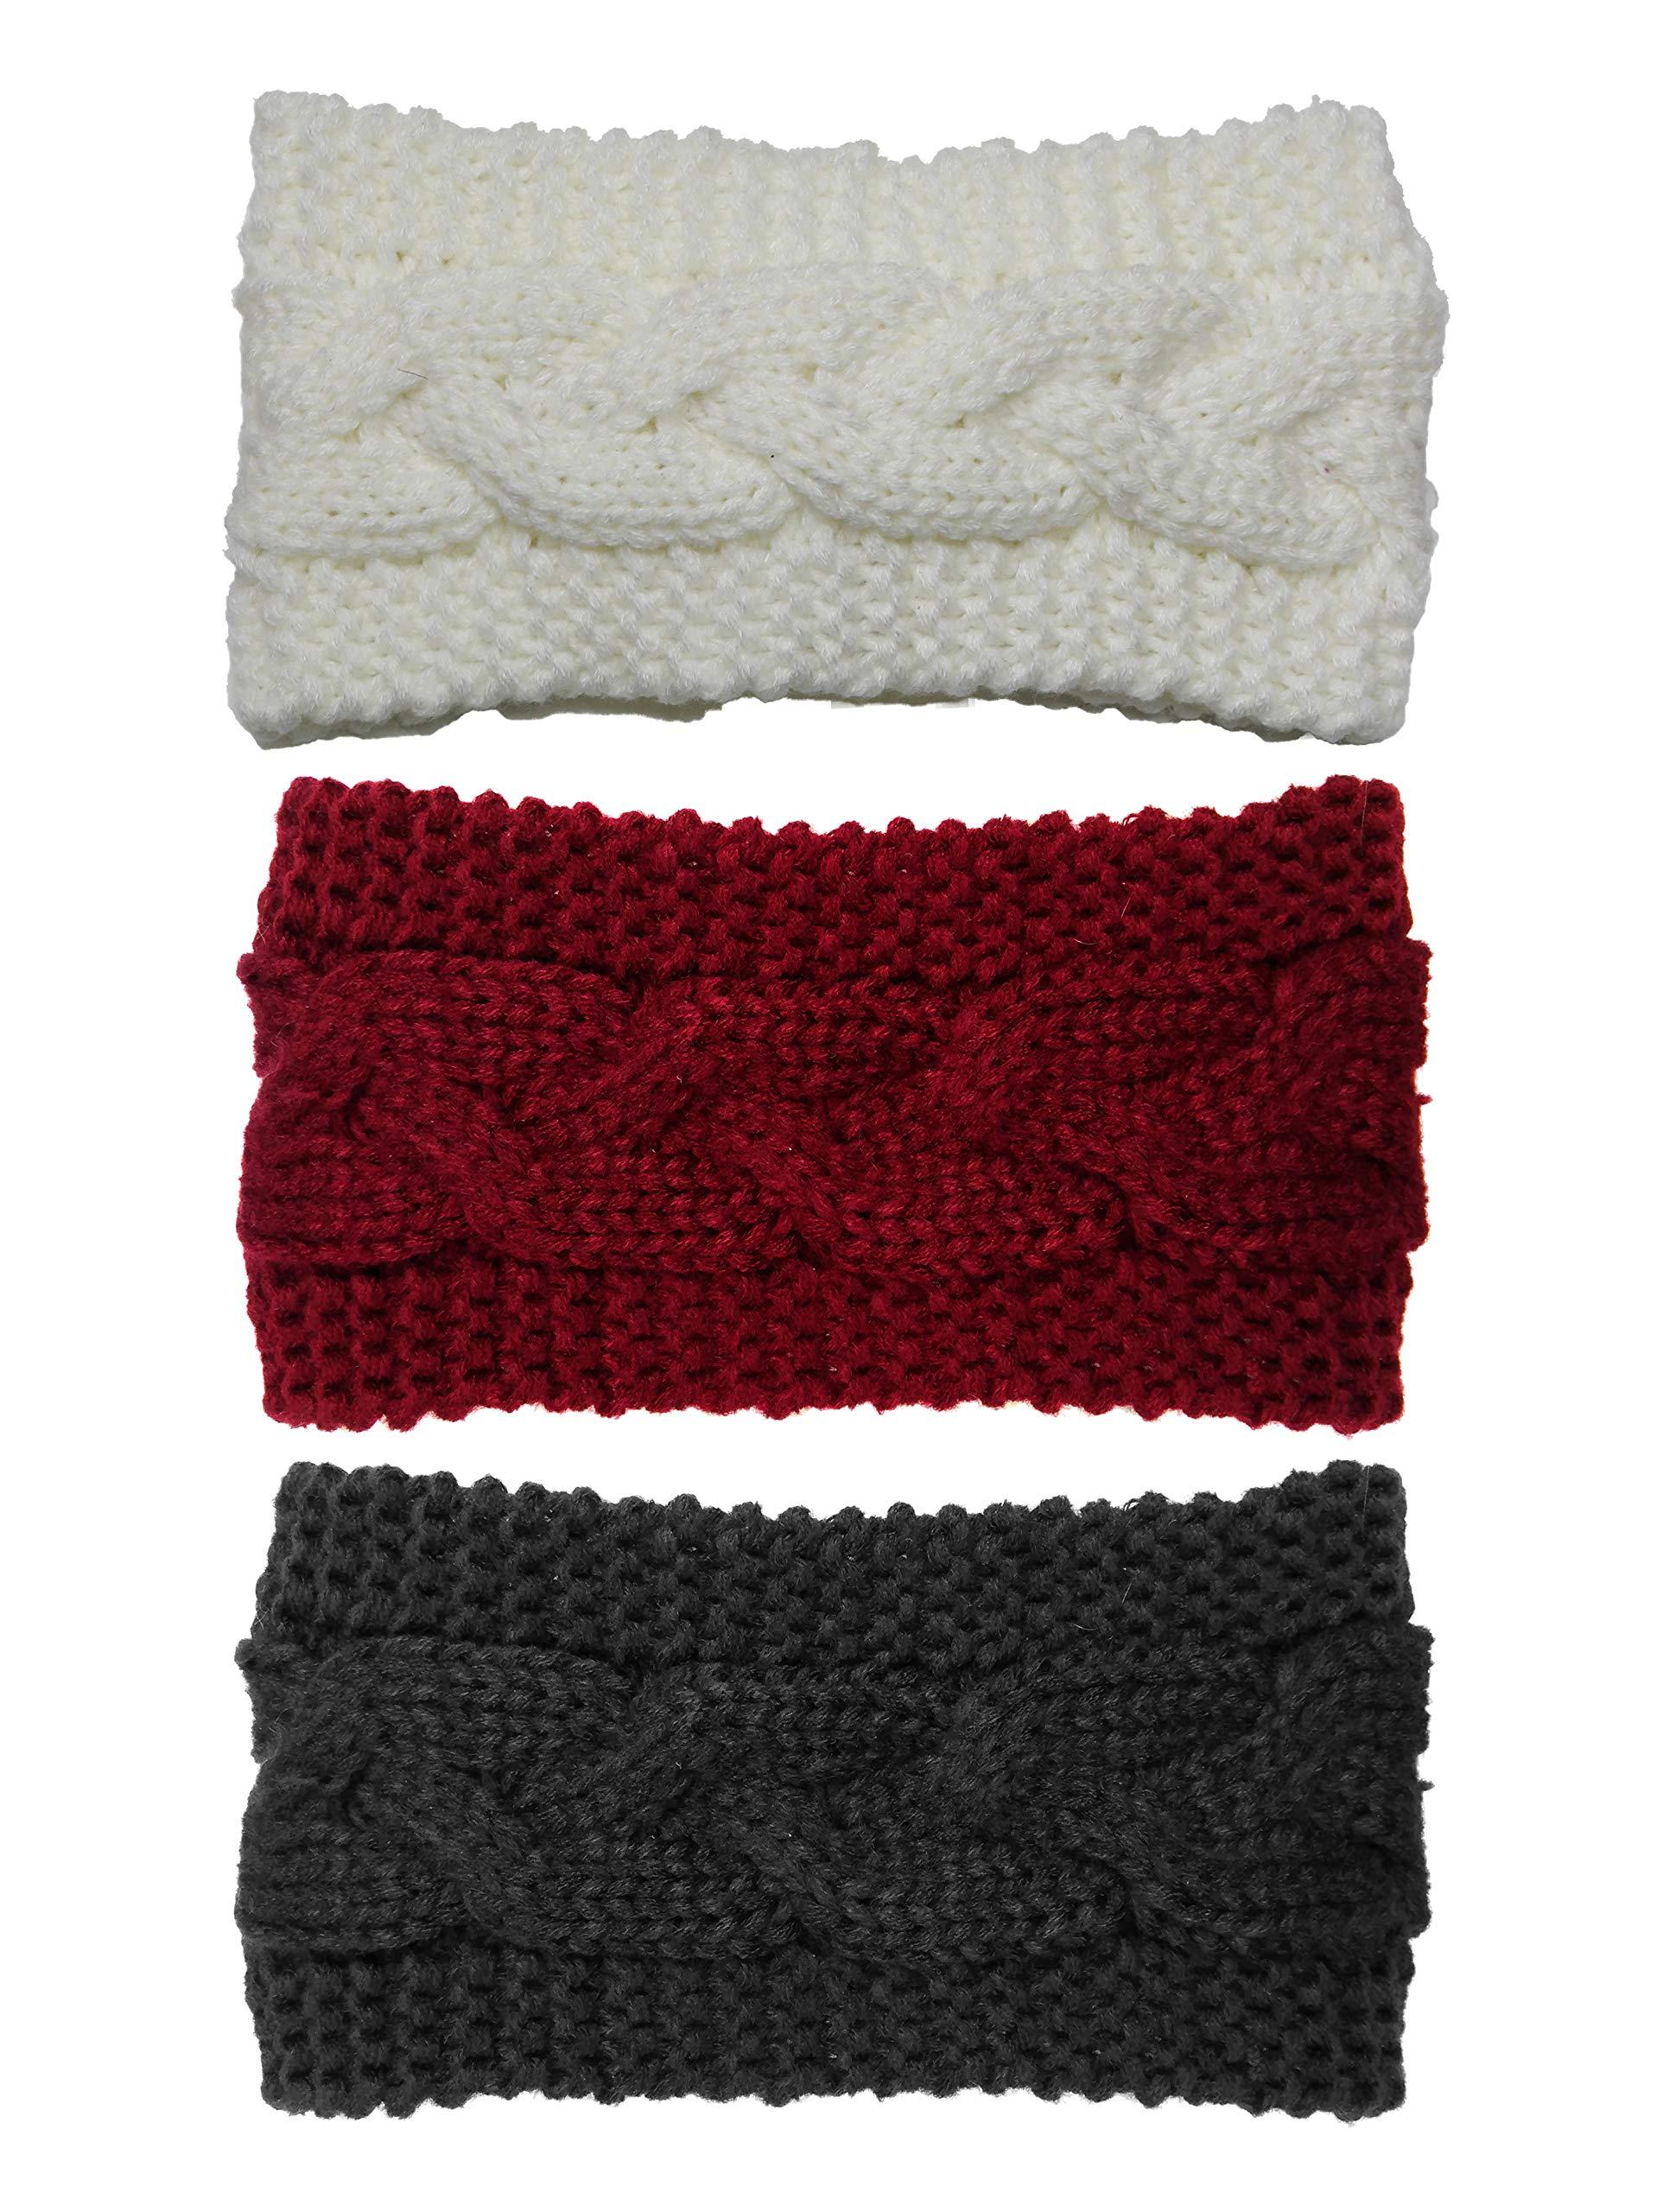 Bertelli 3 Pack Womens Winter Knit Headband & Hairband Ear Warmer (Black-white-wine) by Bertelli